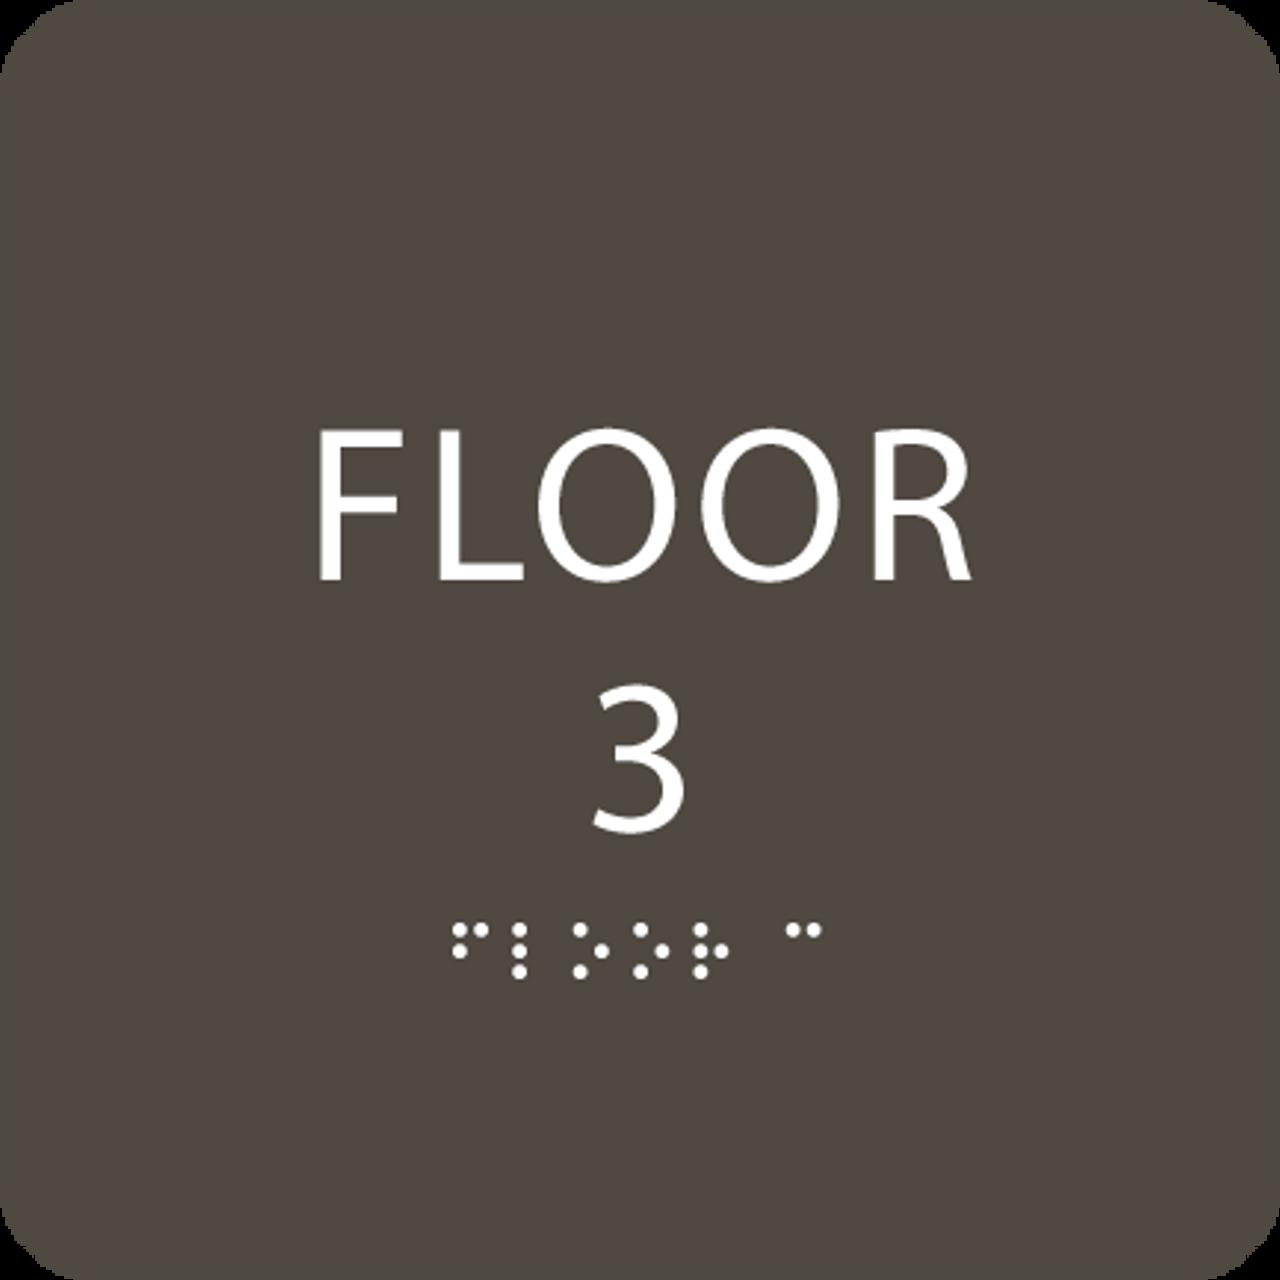 Olive Floor 3 Identification Sign